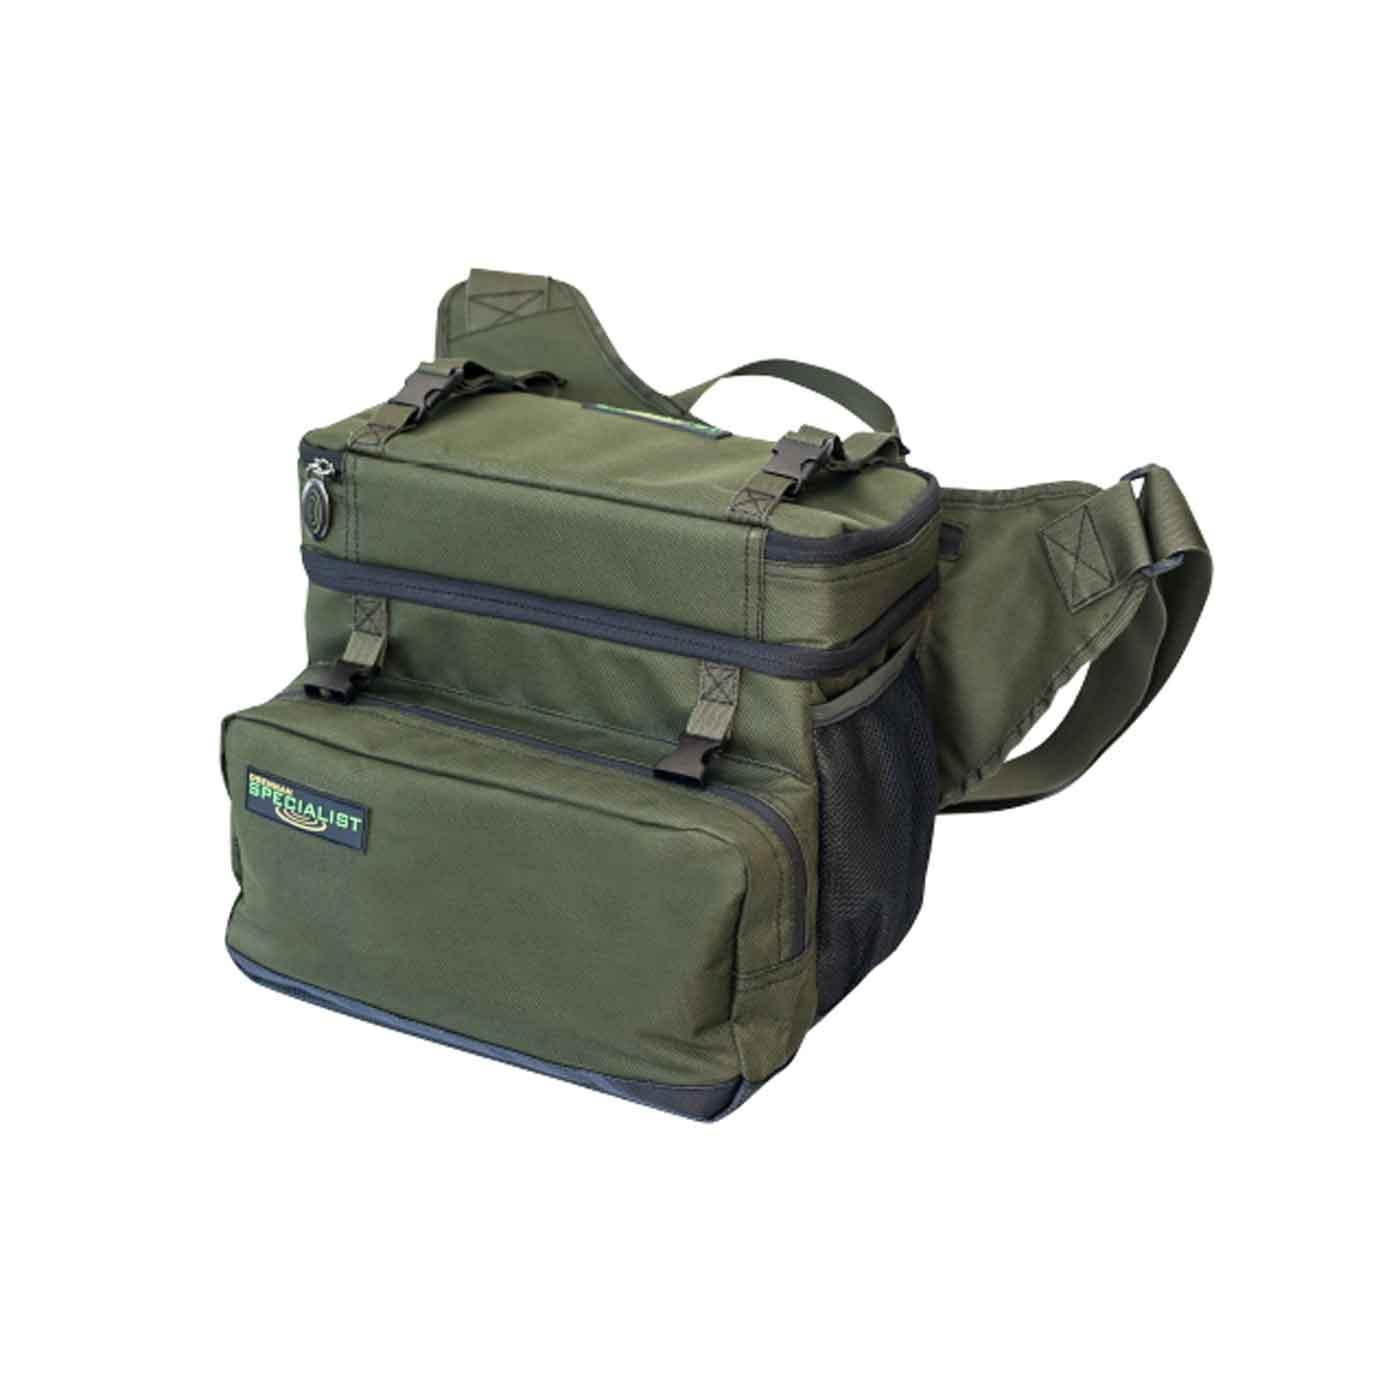 Drennan Specialist Compact Roving Bag 20Ltr